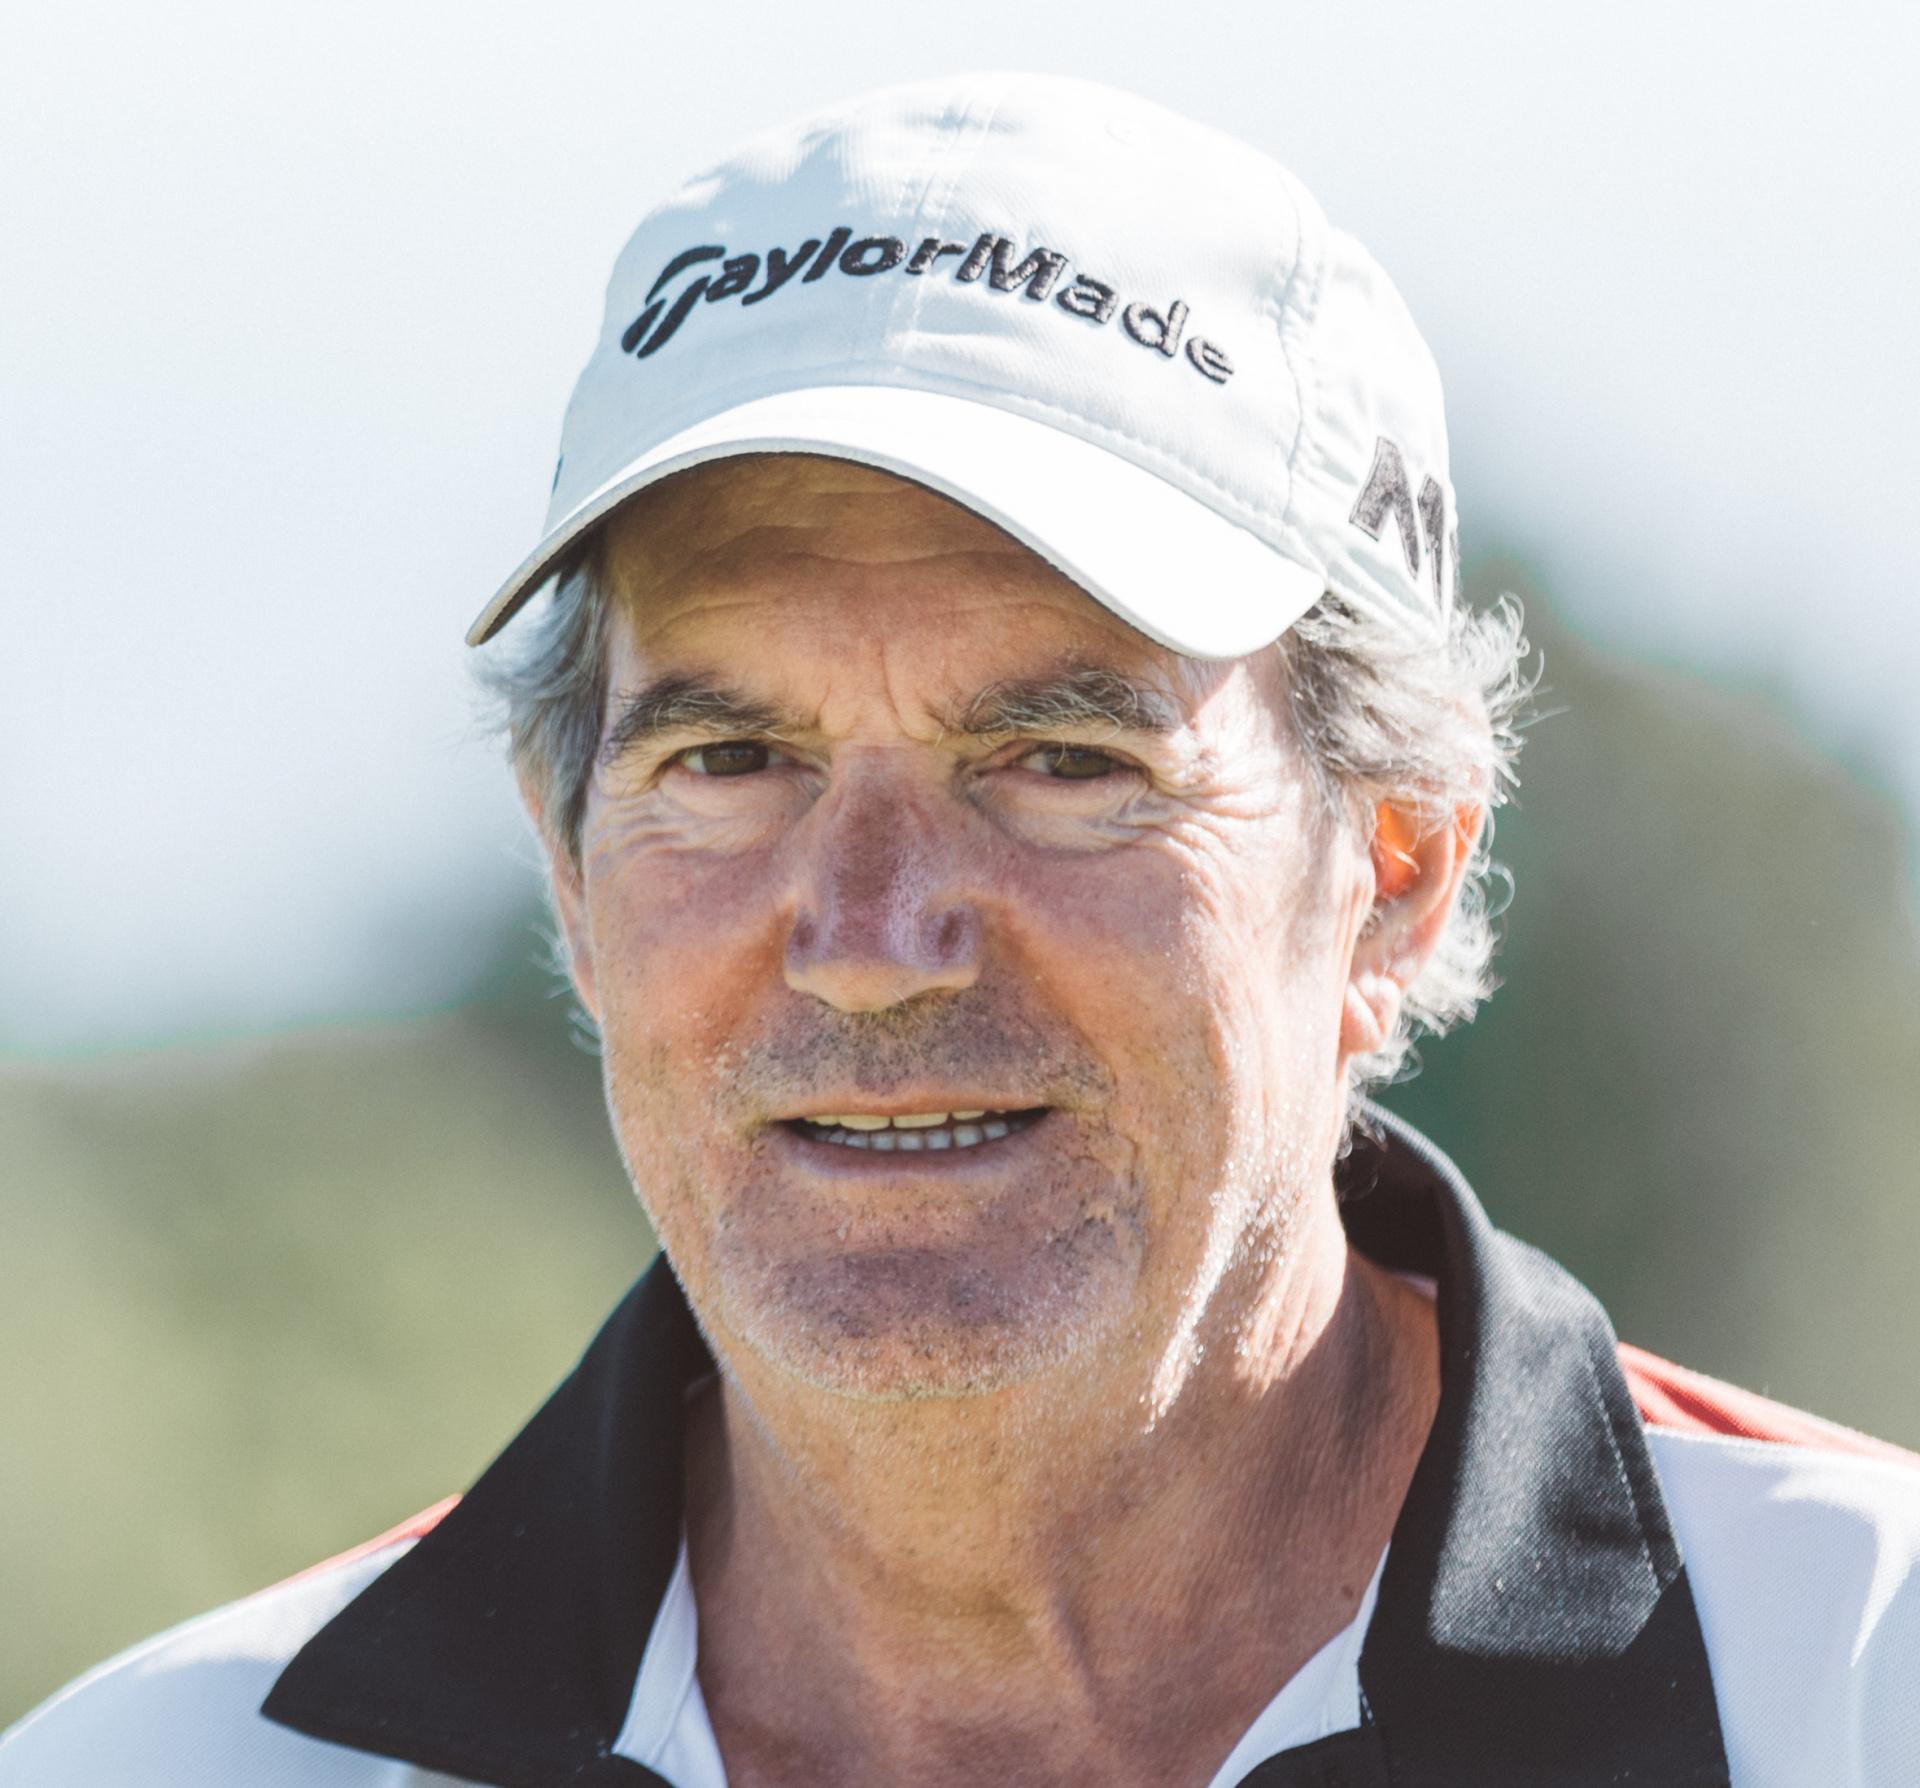 Jean-Luc Galiay